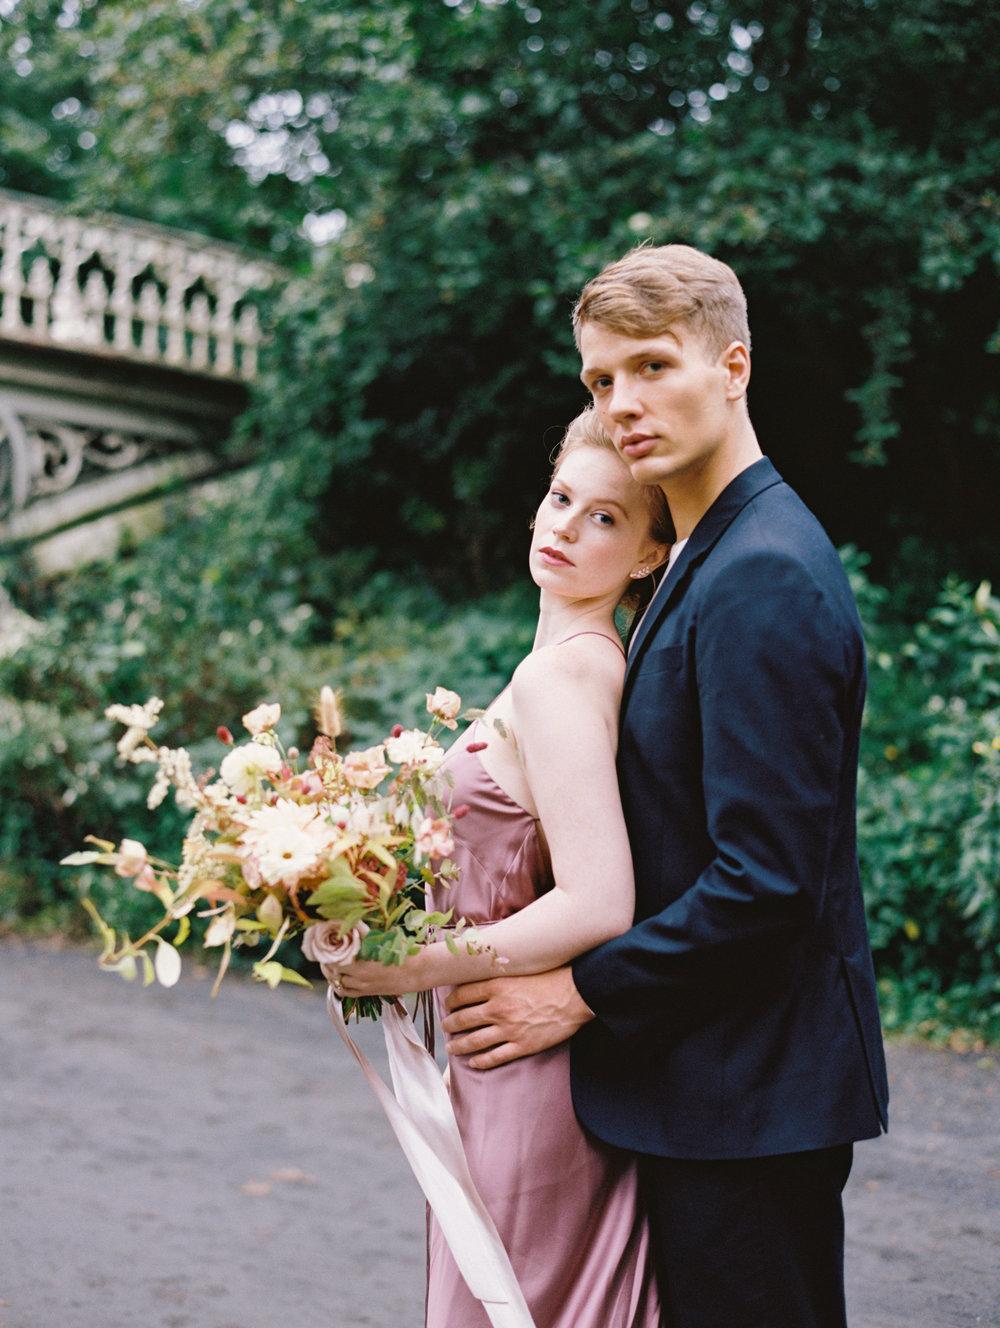 kelsandmichael_bridaleditorial_harvestelopement-5.jpg